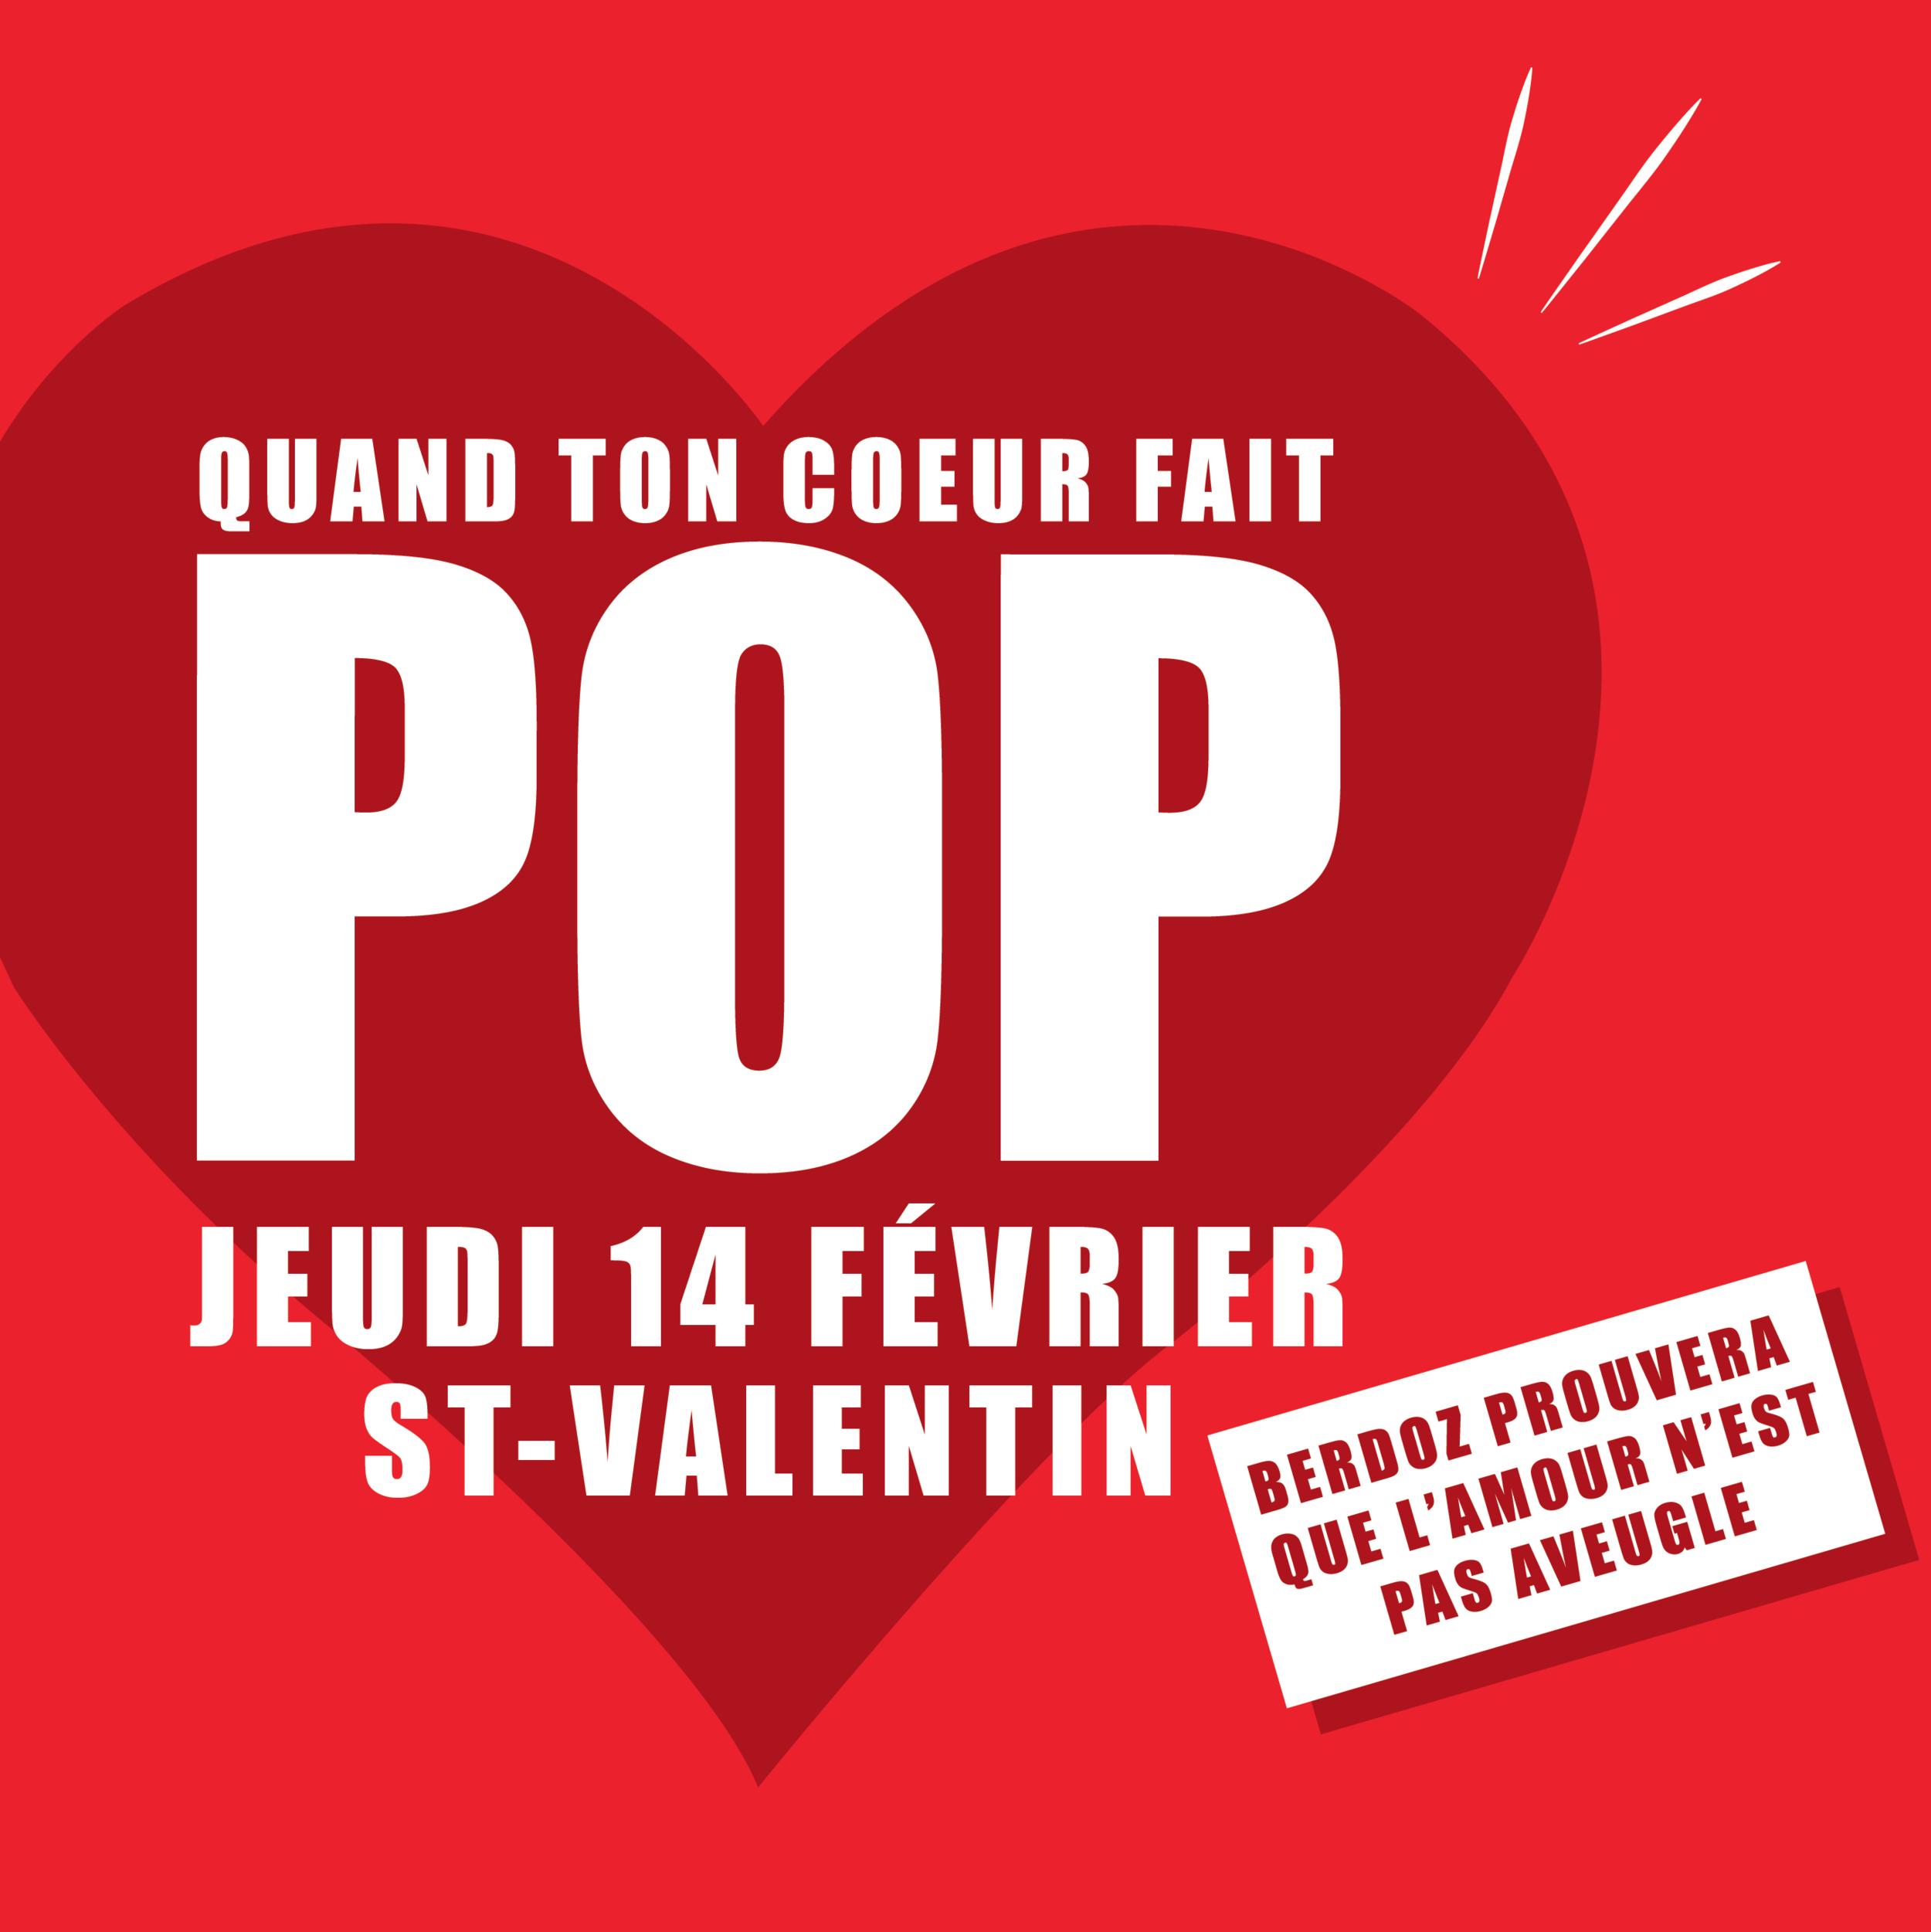 St-Valentin V3-03.png